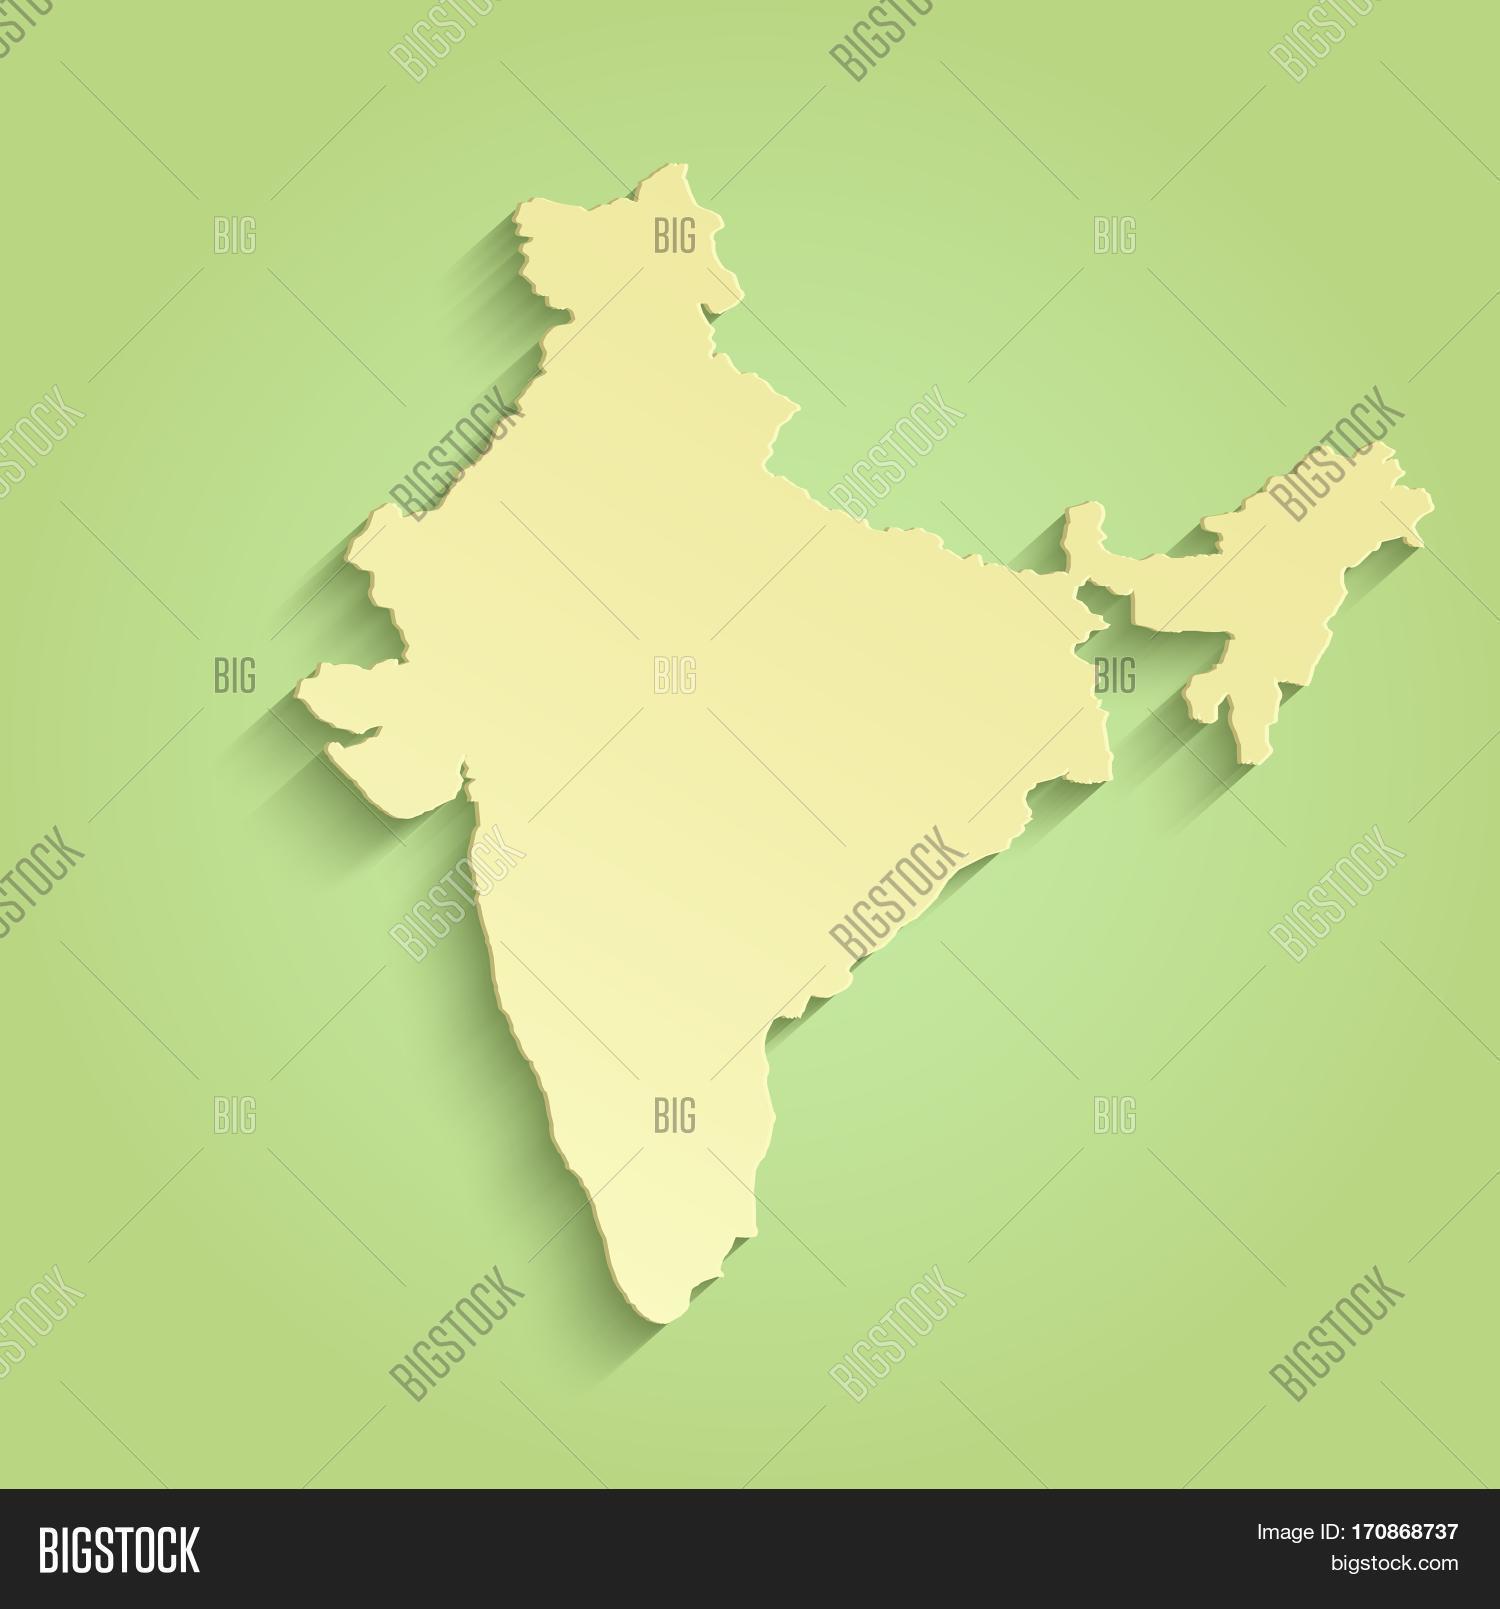 India Map Green Yellow Raster Image & Photo   Bigstock